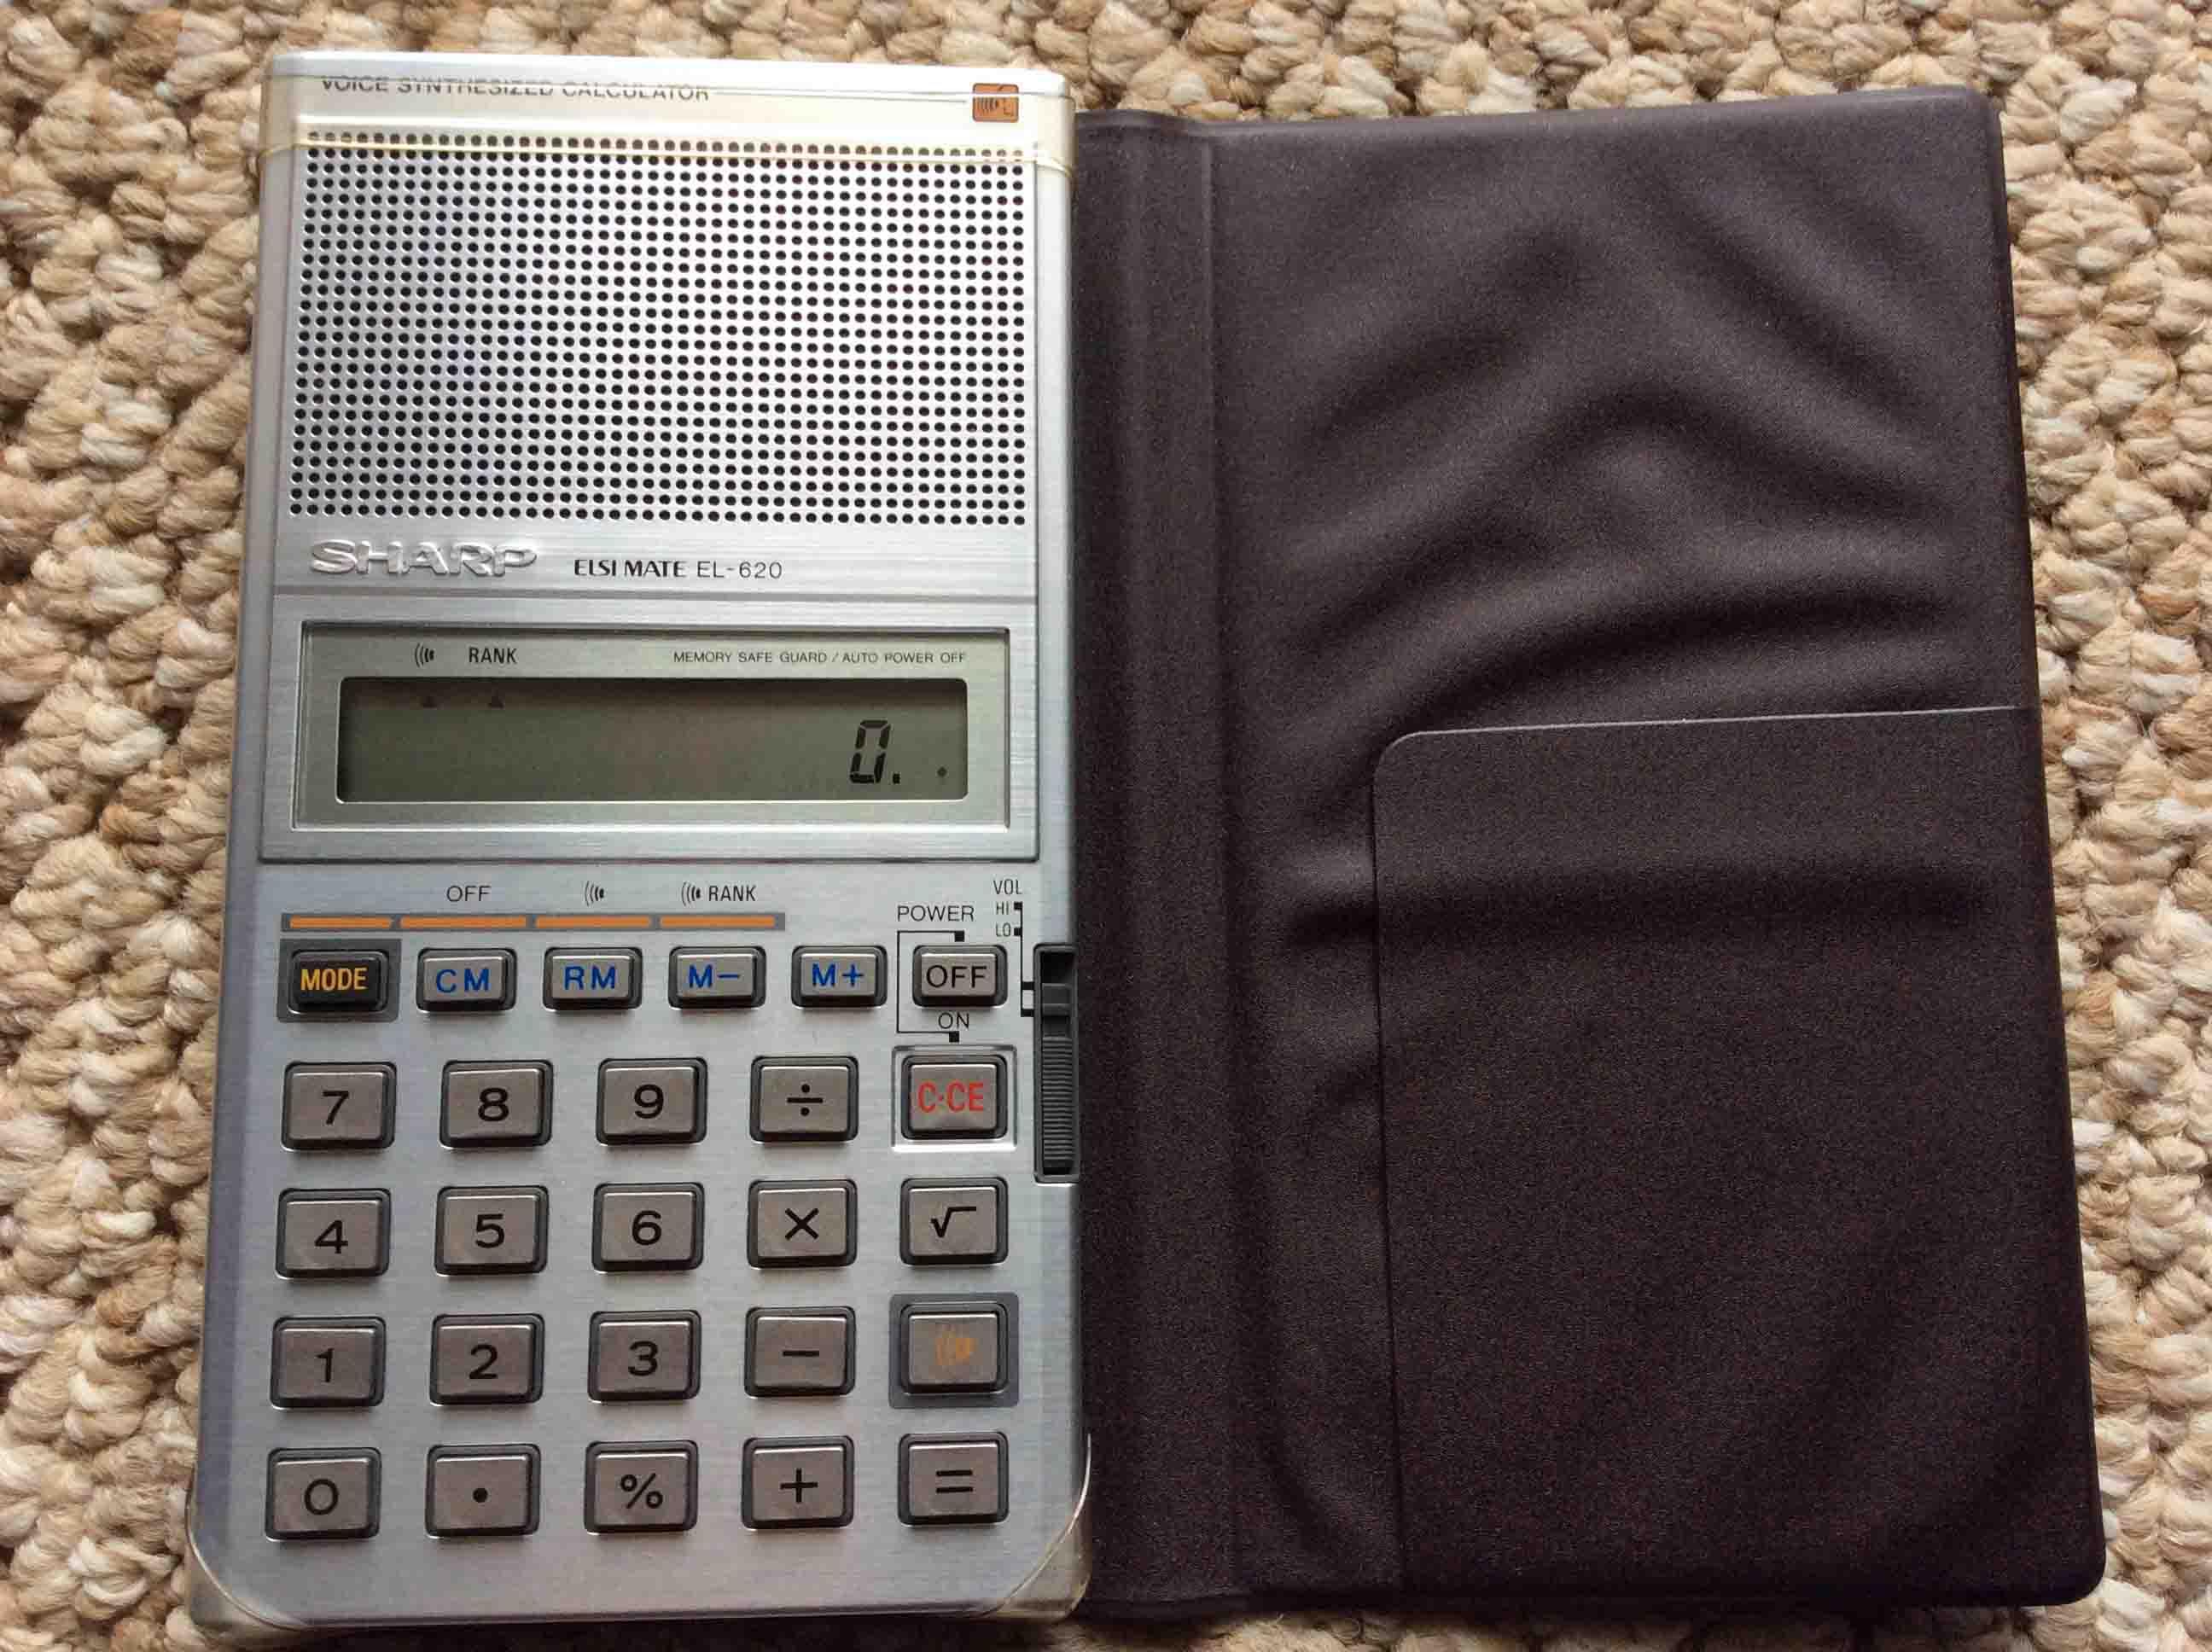 Sharp elsi mate vintage talking calculator el-620 review   tom's.